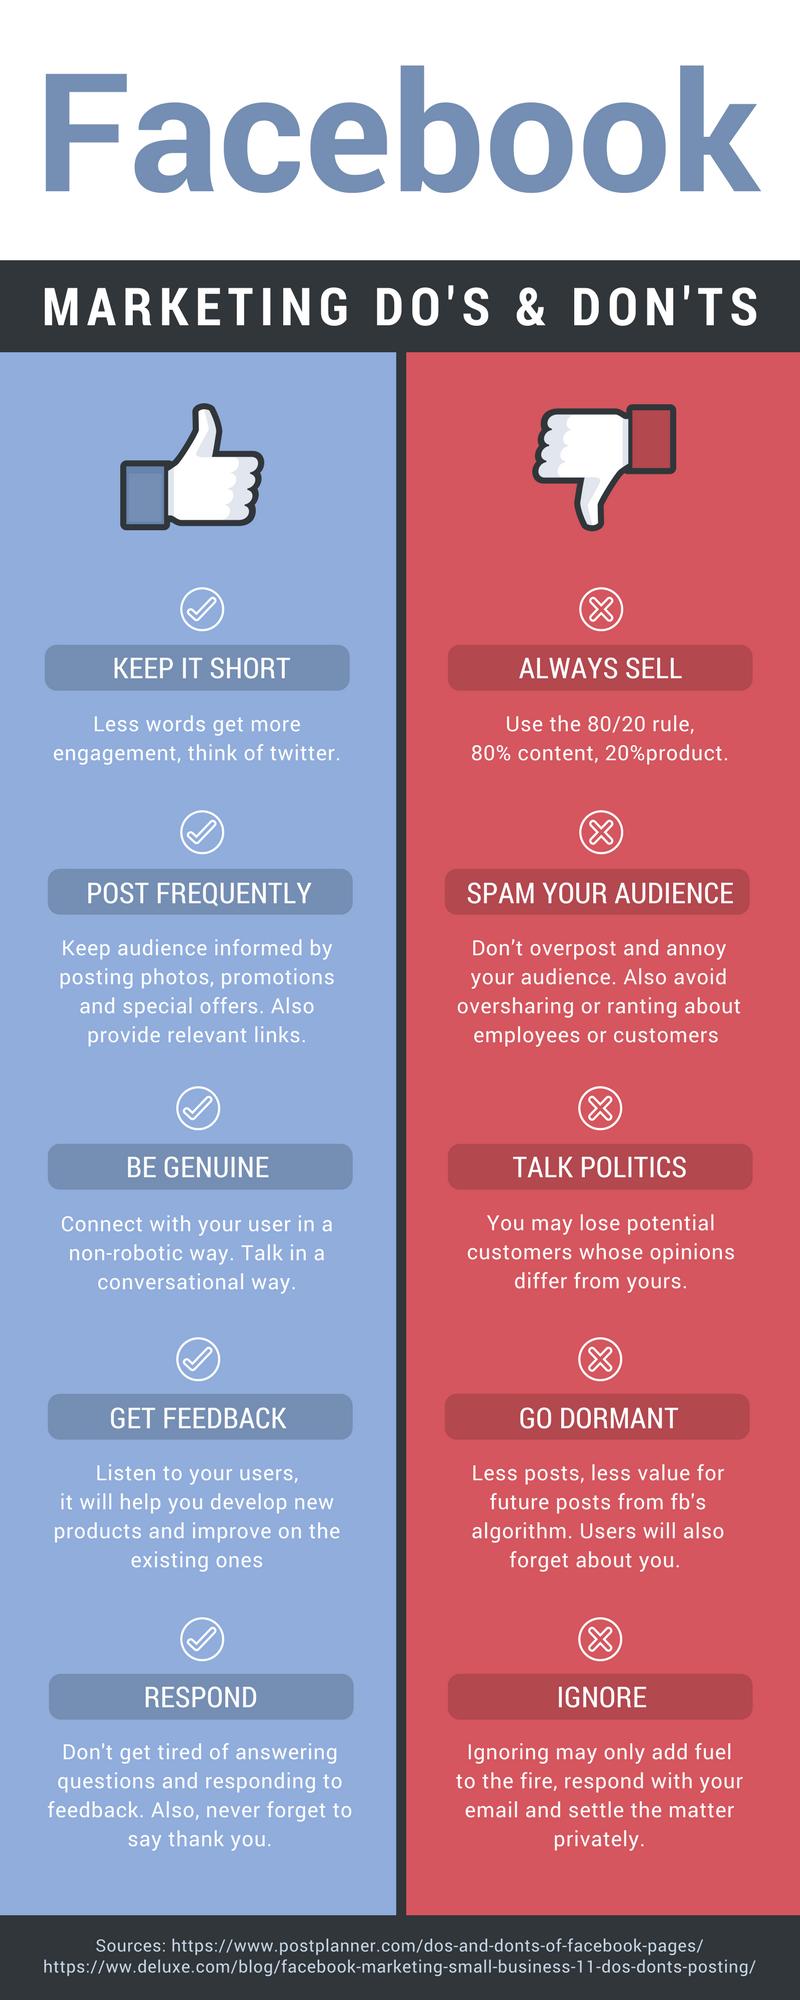 Facebook Do's & Don'ts Infographic